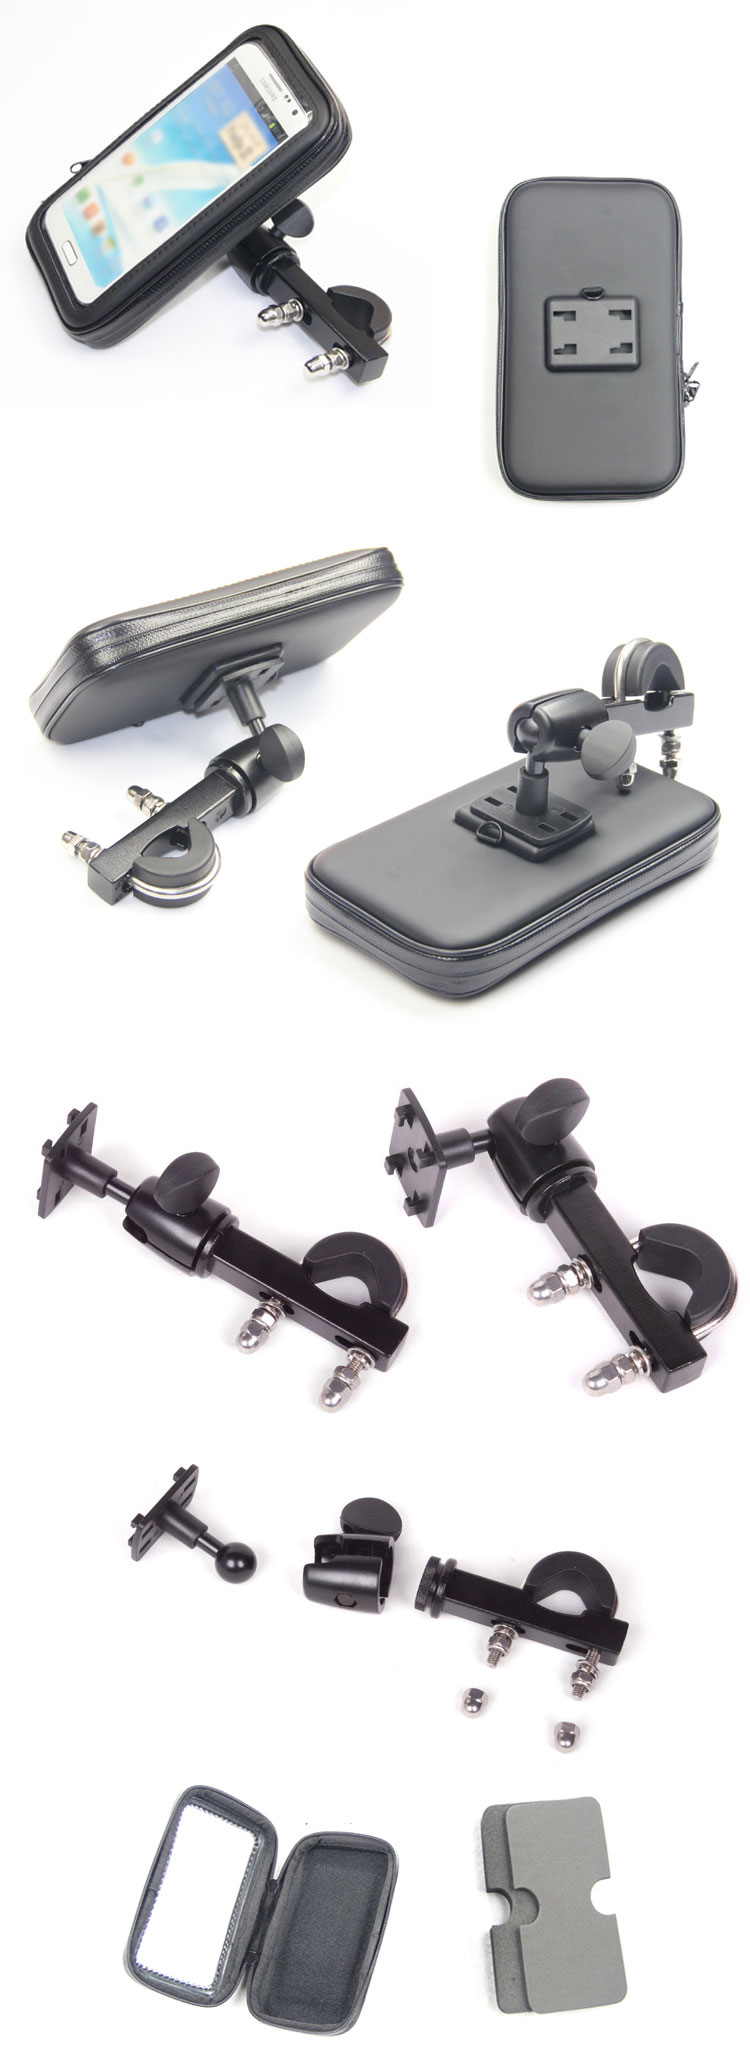 Aluminum Alloy Bracket Bike Bicycle Waterproof Phone Case Cover Bag Pouch Handlebar Mount Holder Cradle